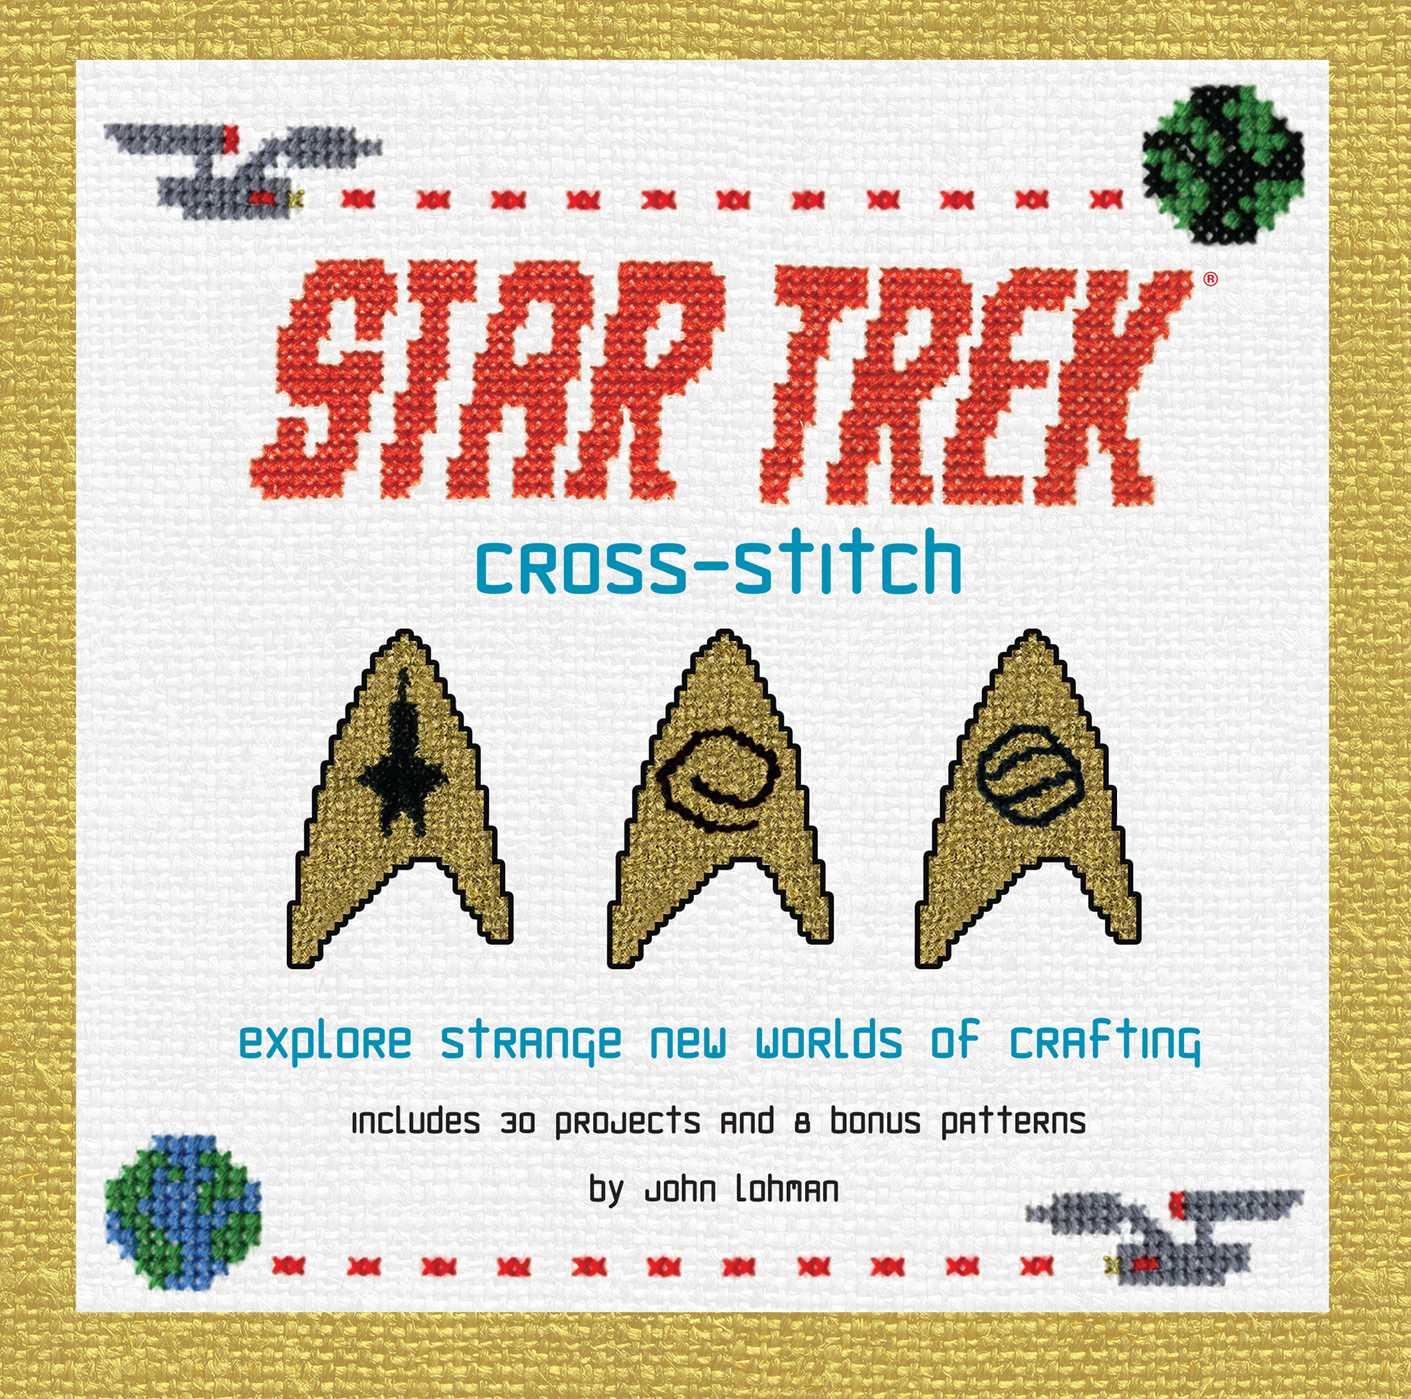 Cross stitch 9781476718675 hr